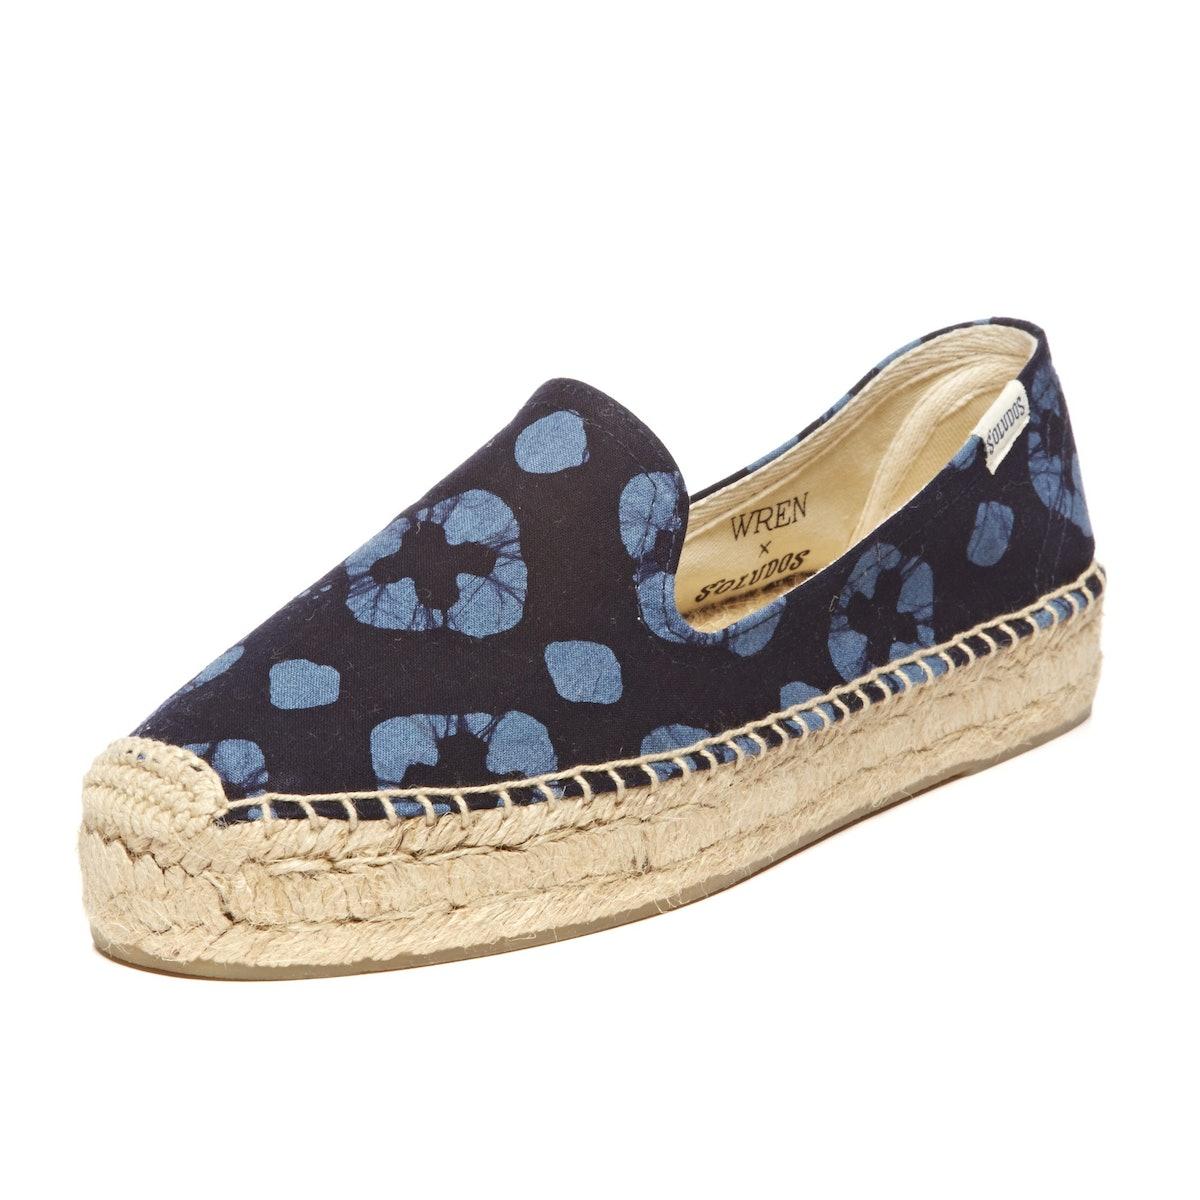 Wren x Soludos platform smoking slipper